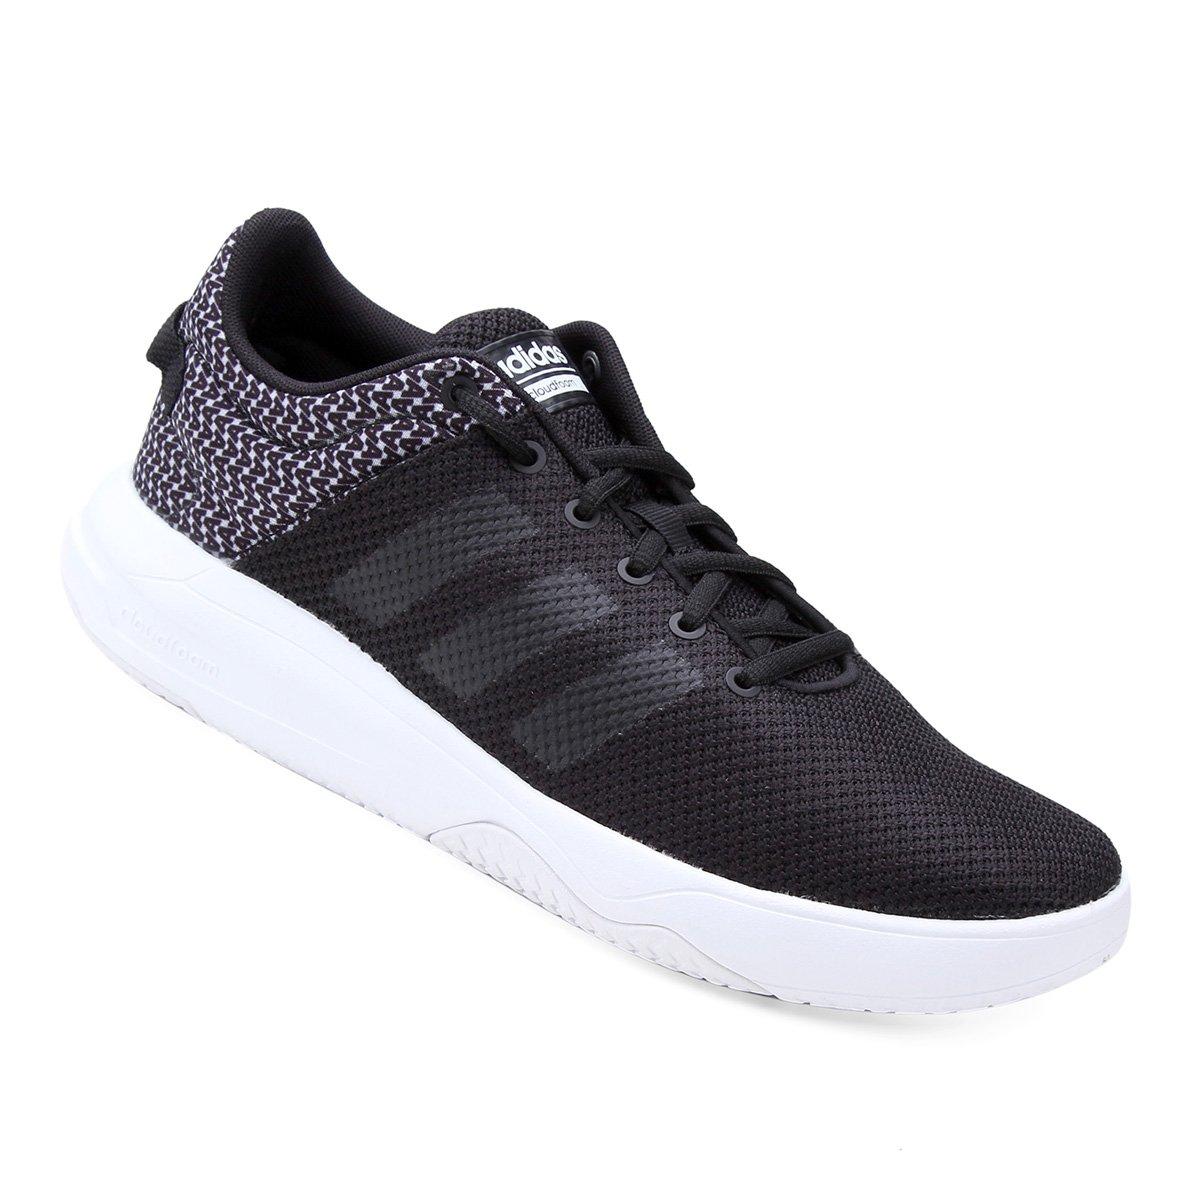 4d3b4692a2 Tênis Adidas Cf Swish - Compre Agora